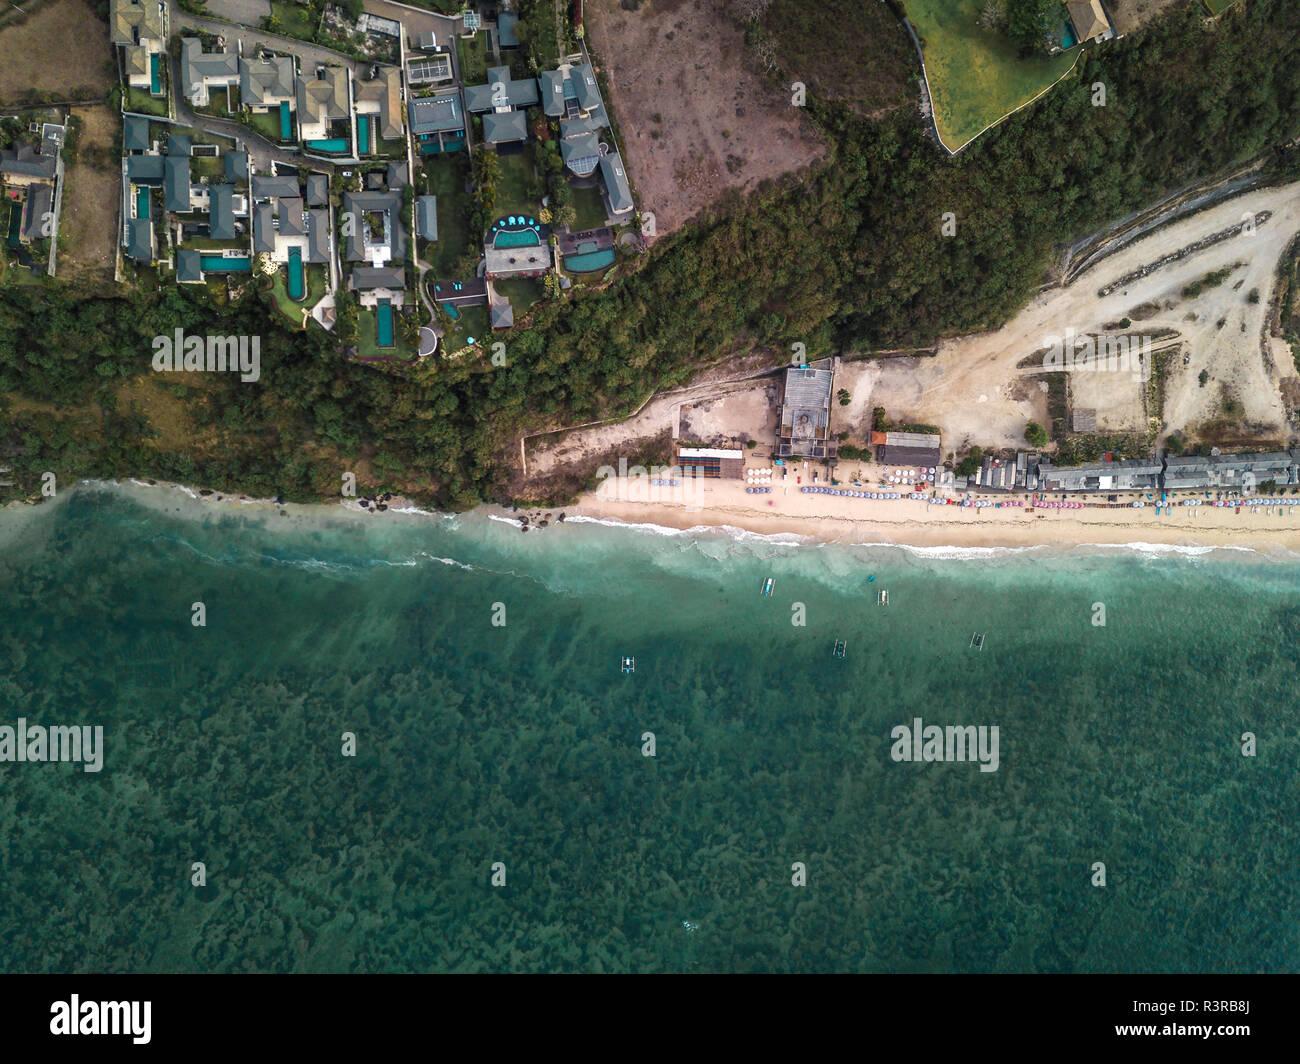 Indonesia, Bali, Aerial view of Pandawa beach Stock Photo